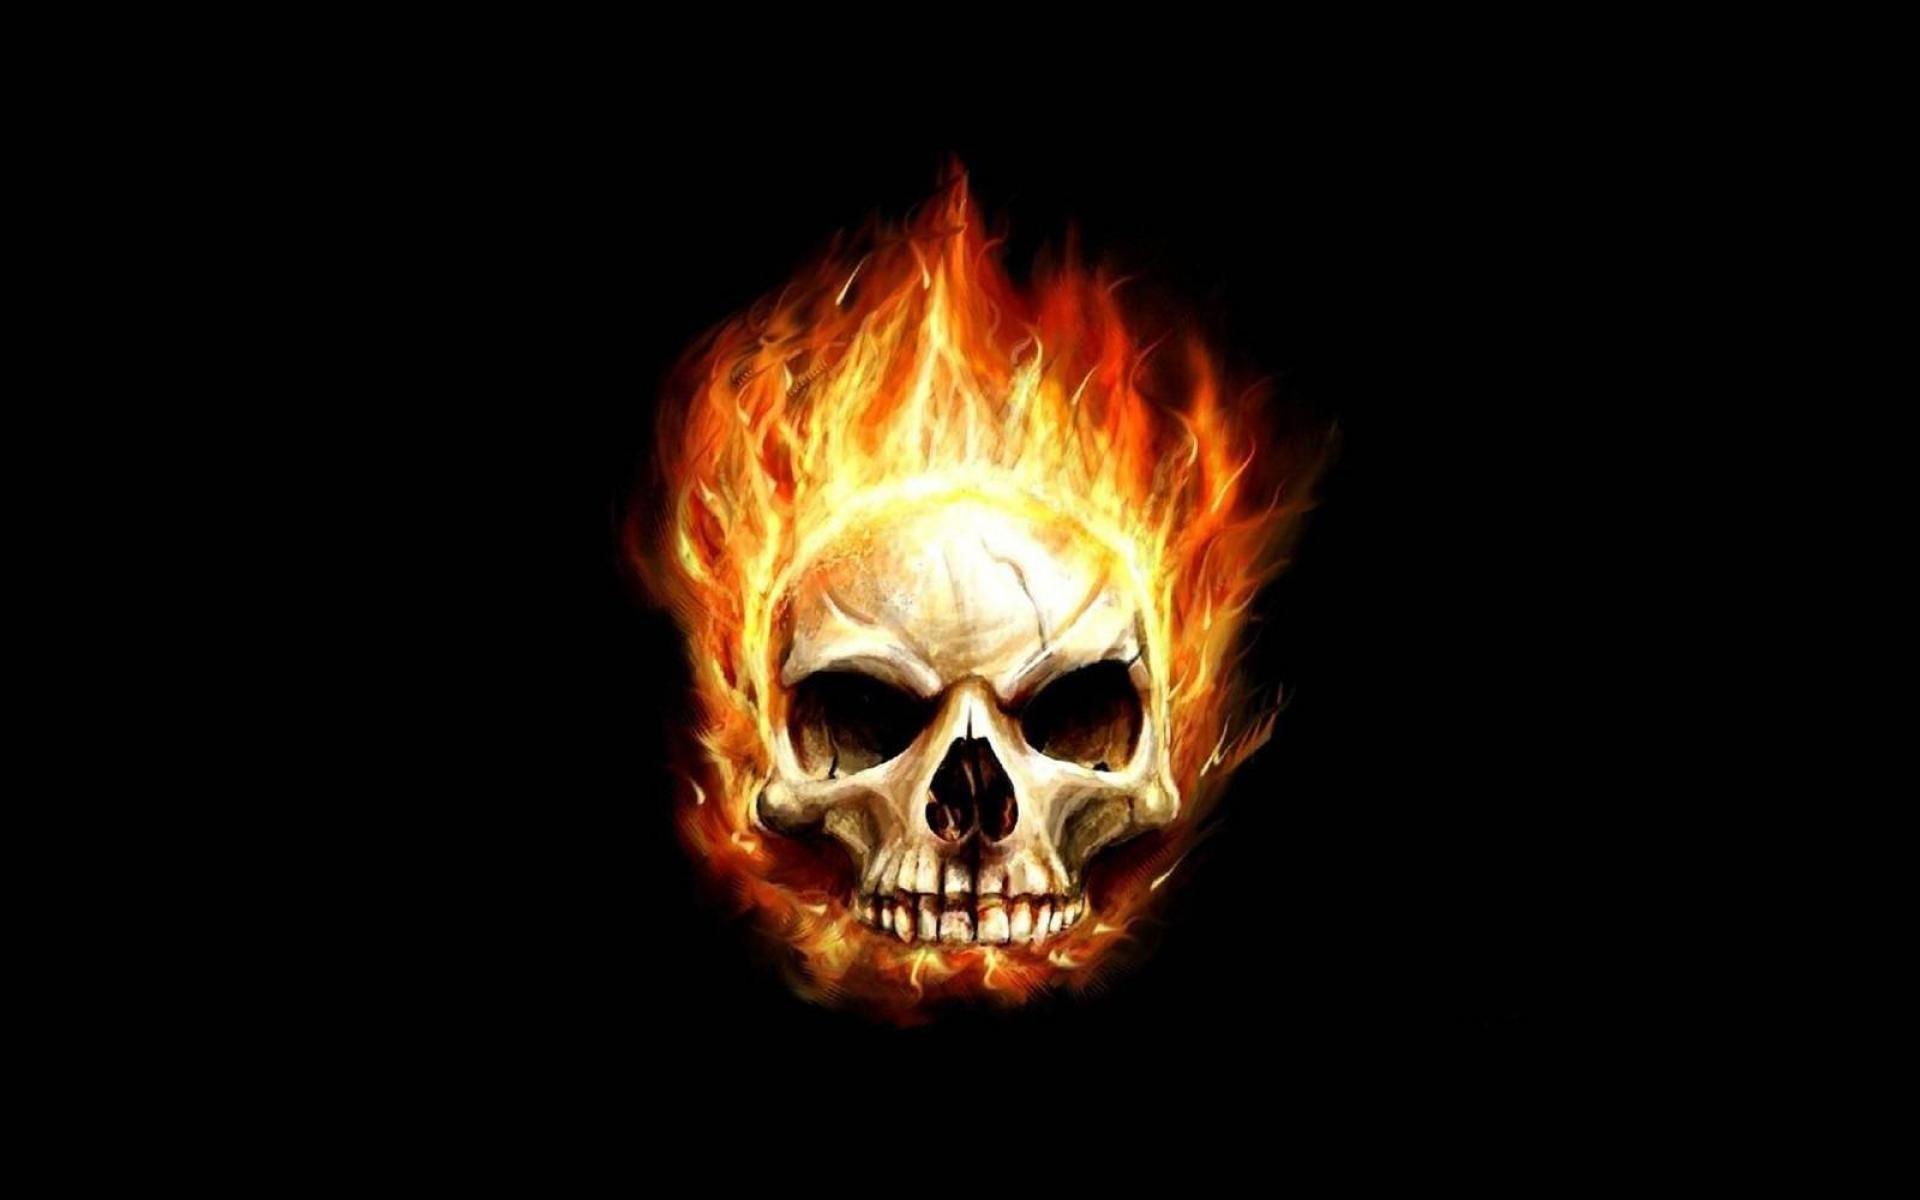 Skull Fire Background 910957 Hd Wallpaper Backgrounds